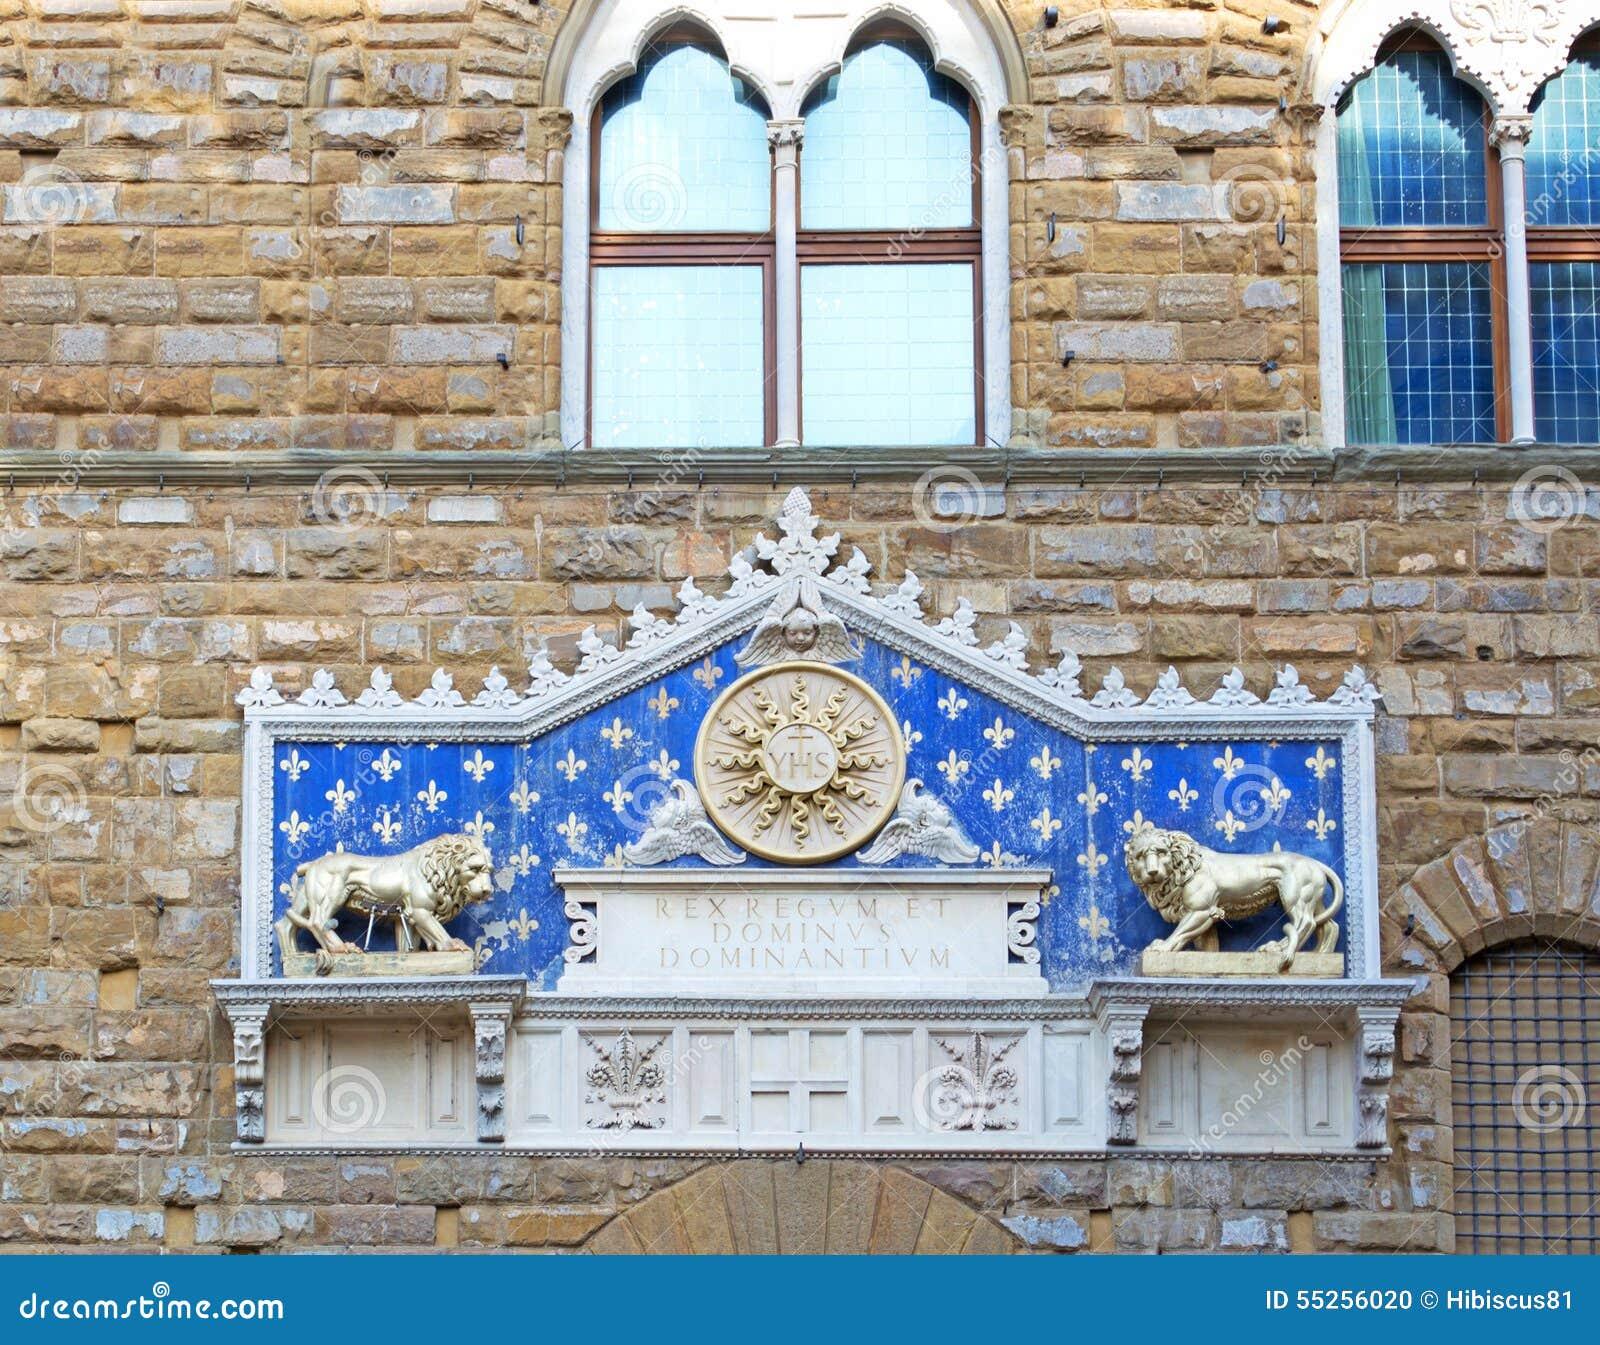 palazzo vecchio entrance - photo #21